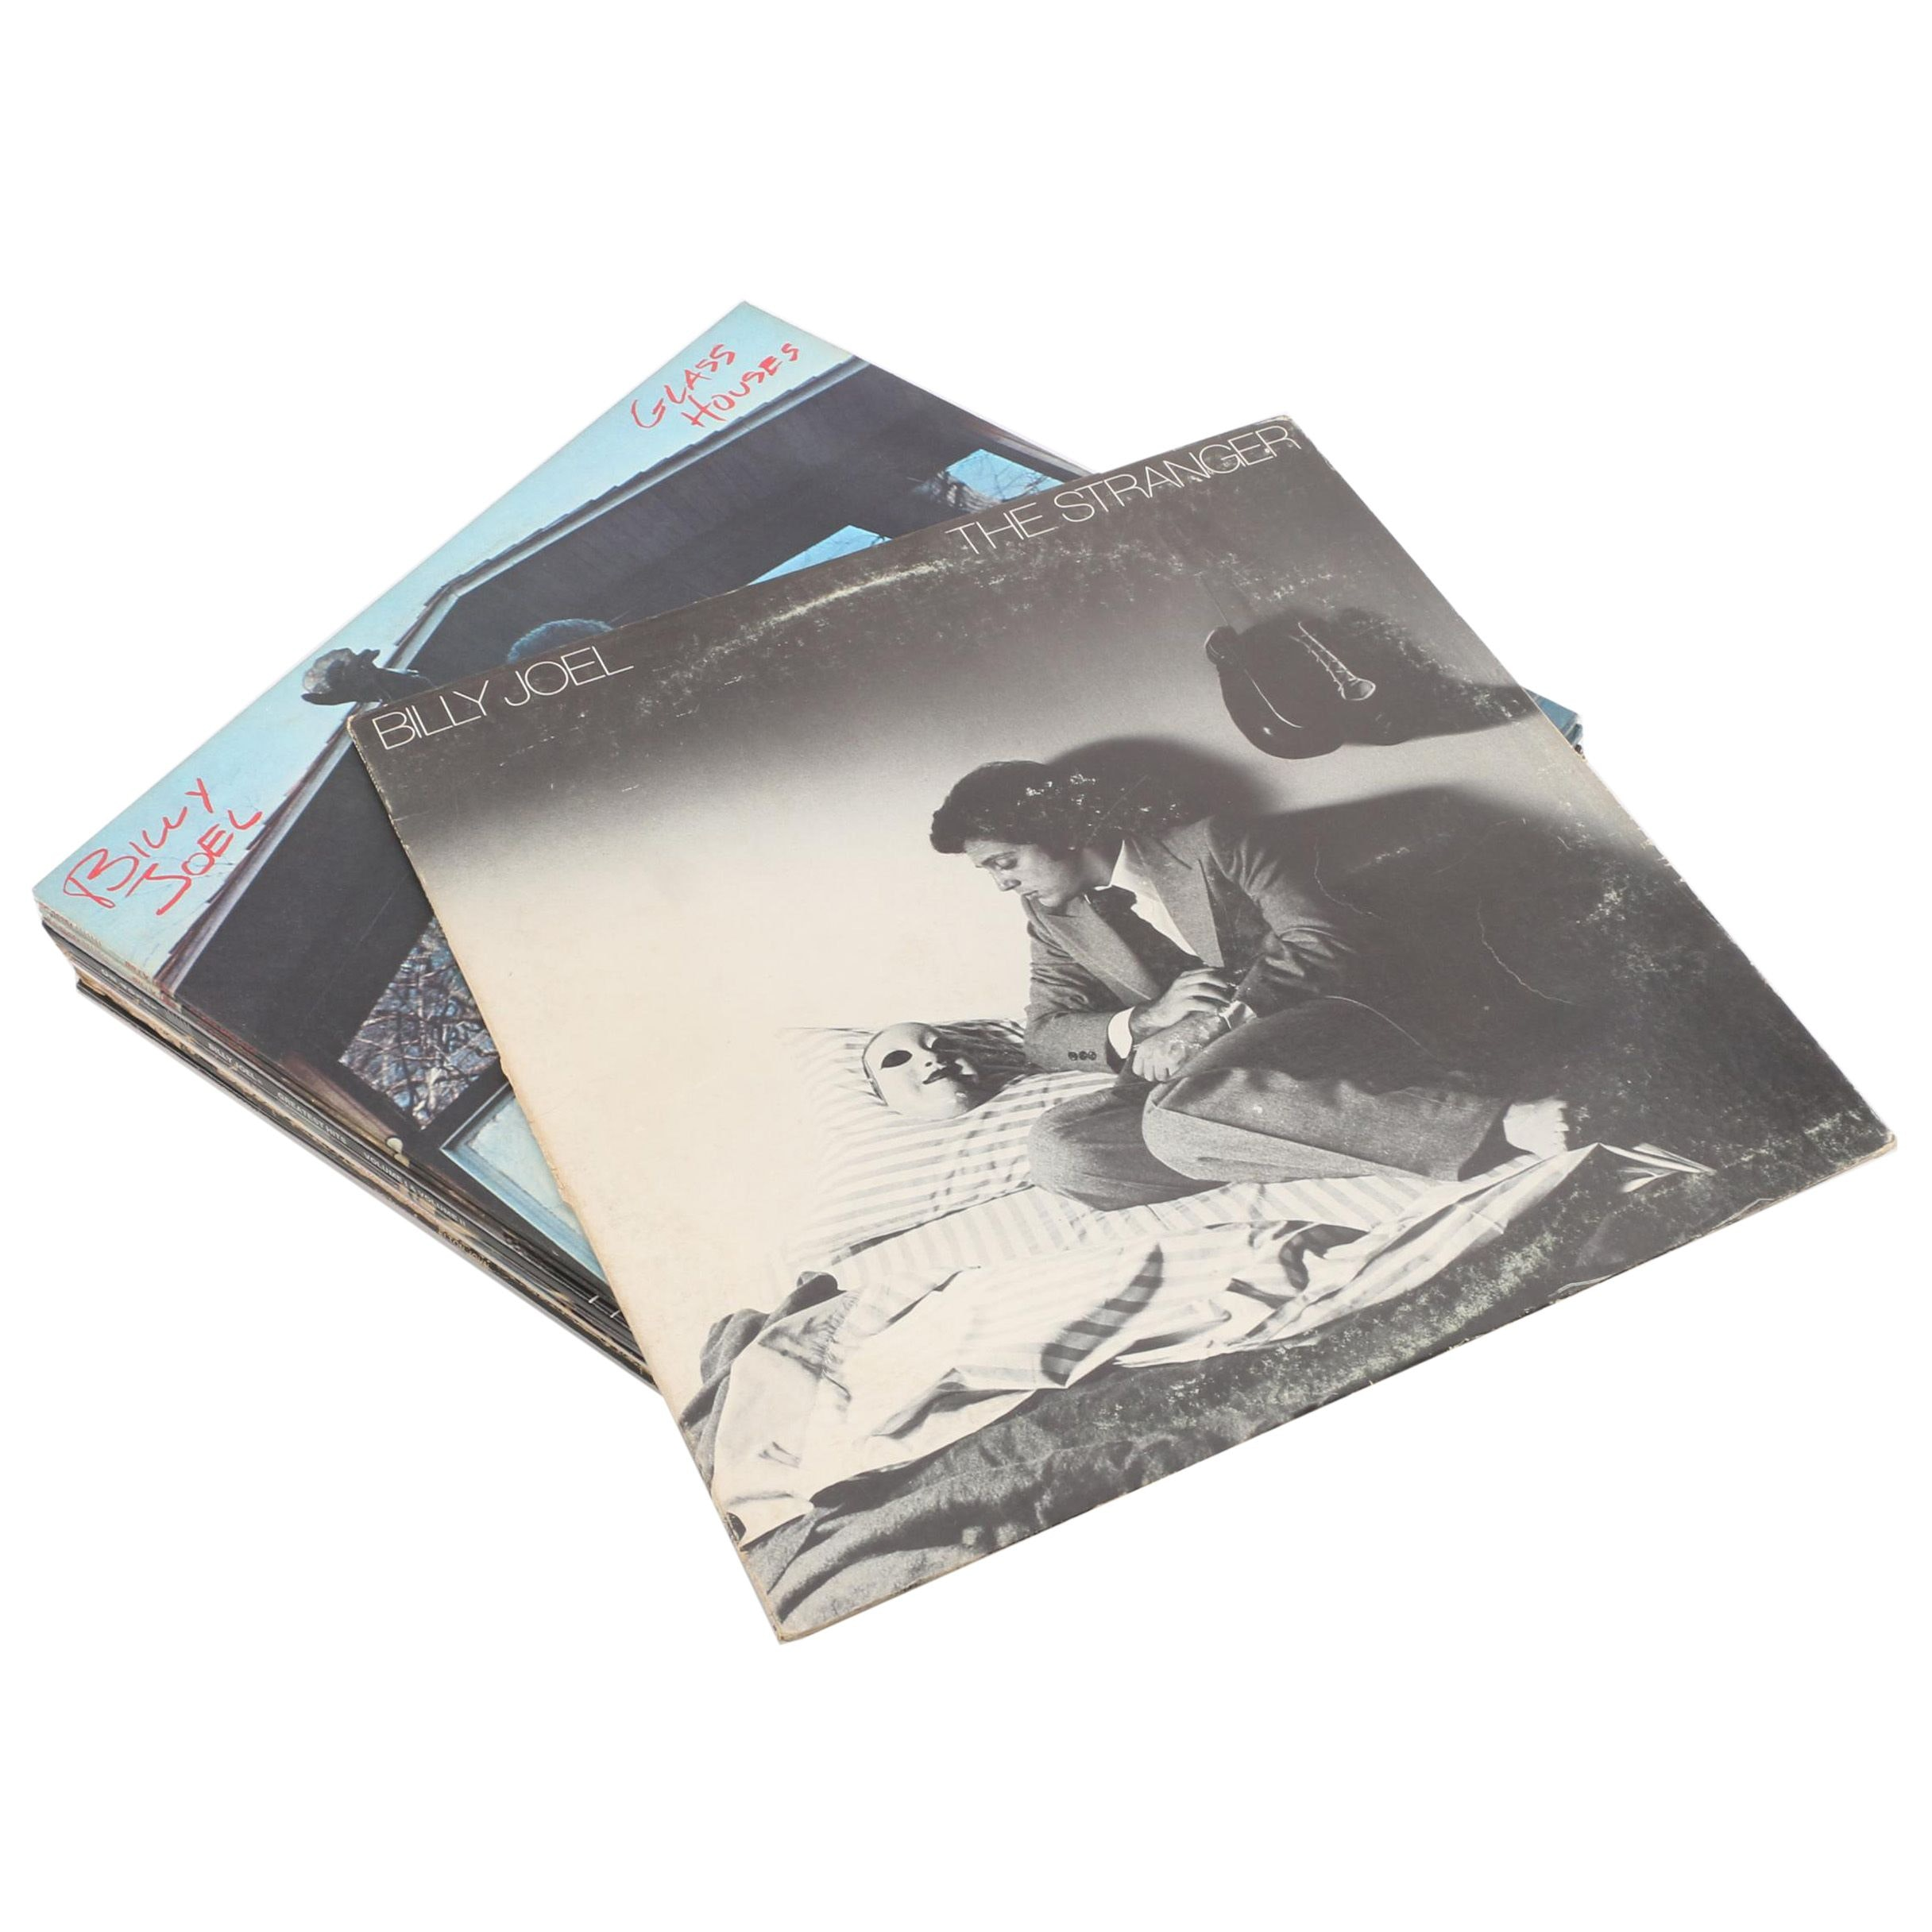 Vintage Rock/Pop Records Featuring Elton John and Billy Joel